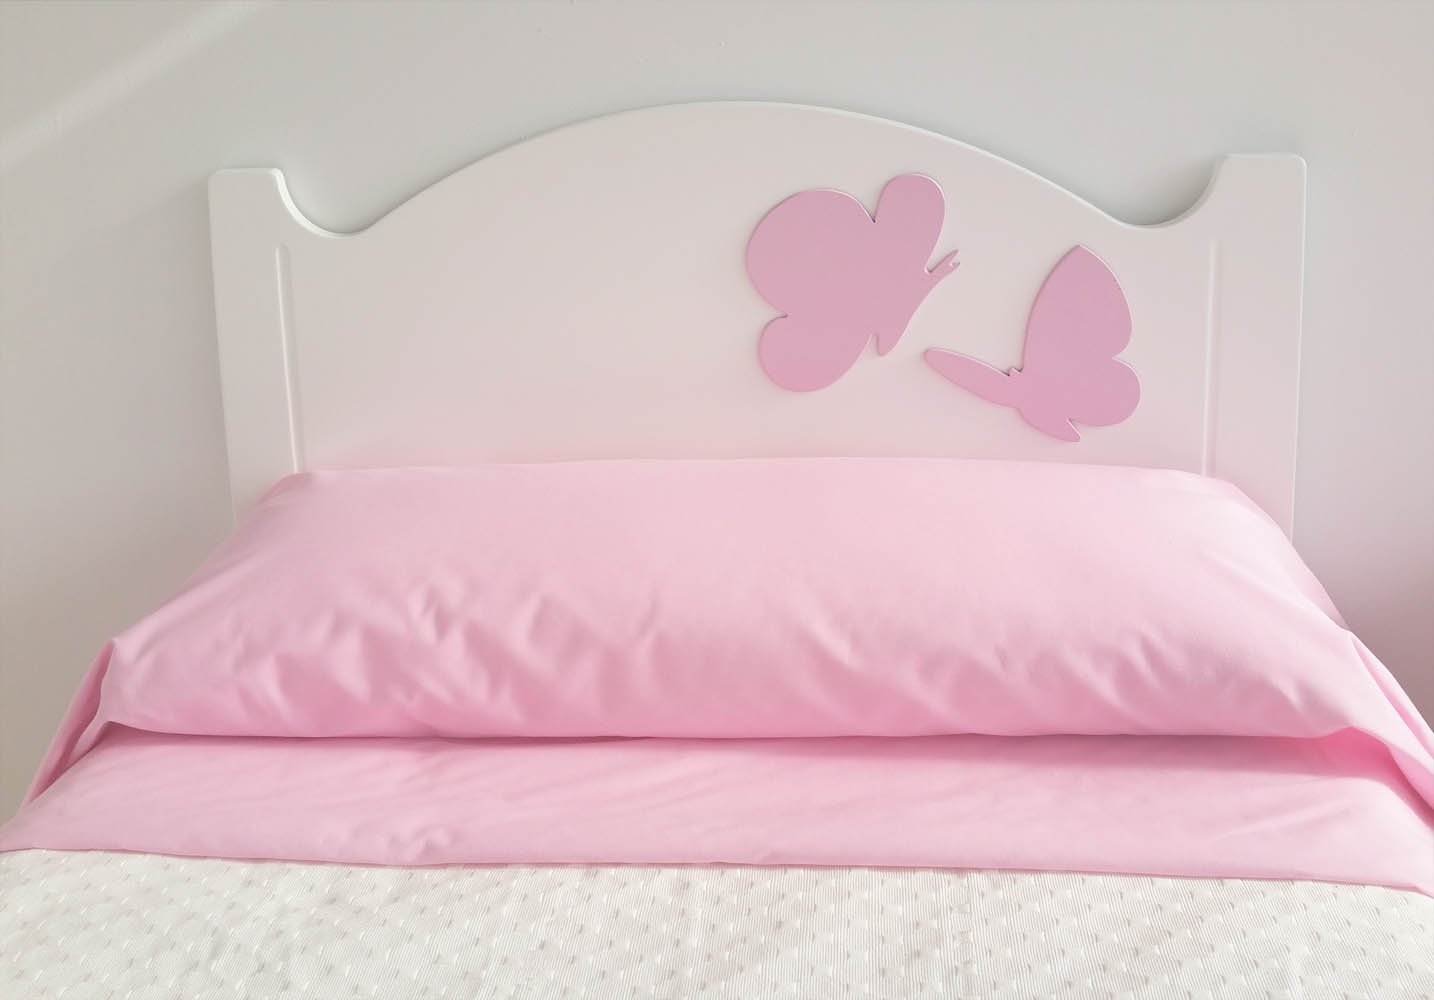 Cabeceros camas infantiles catalogo de muebles muoz - Cabeceros originales ...